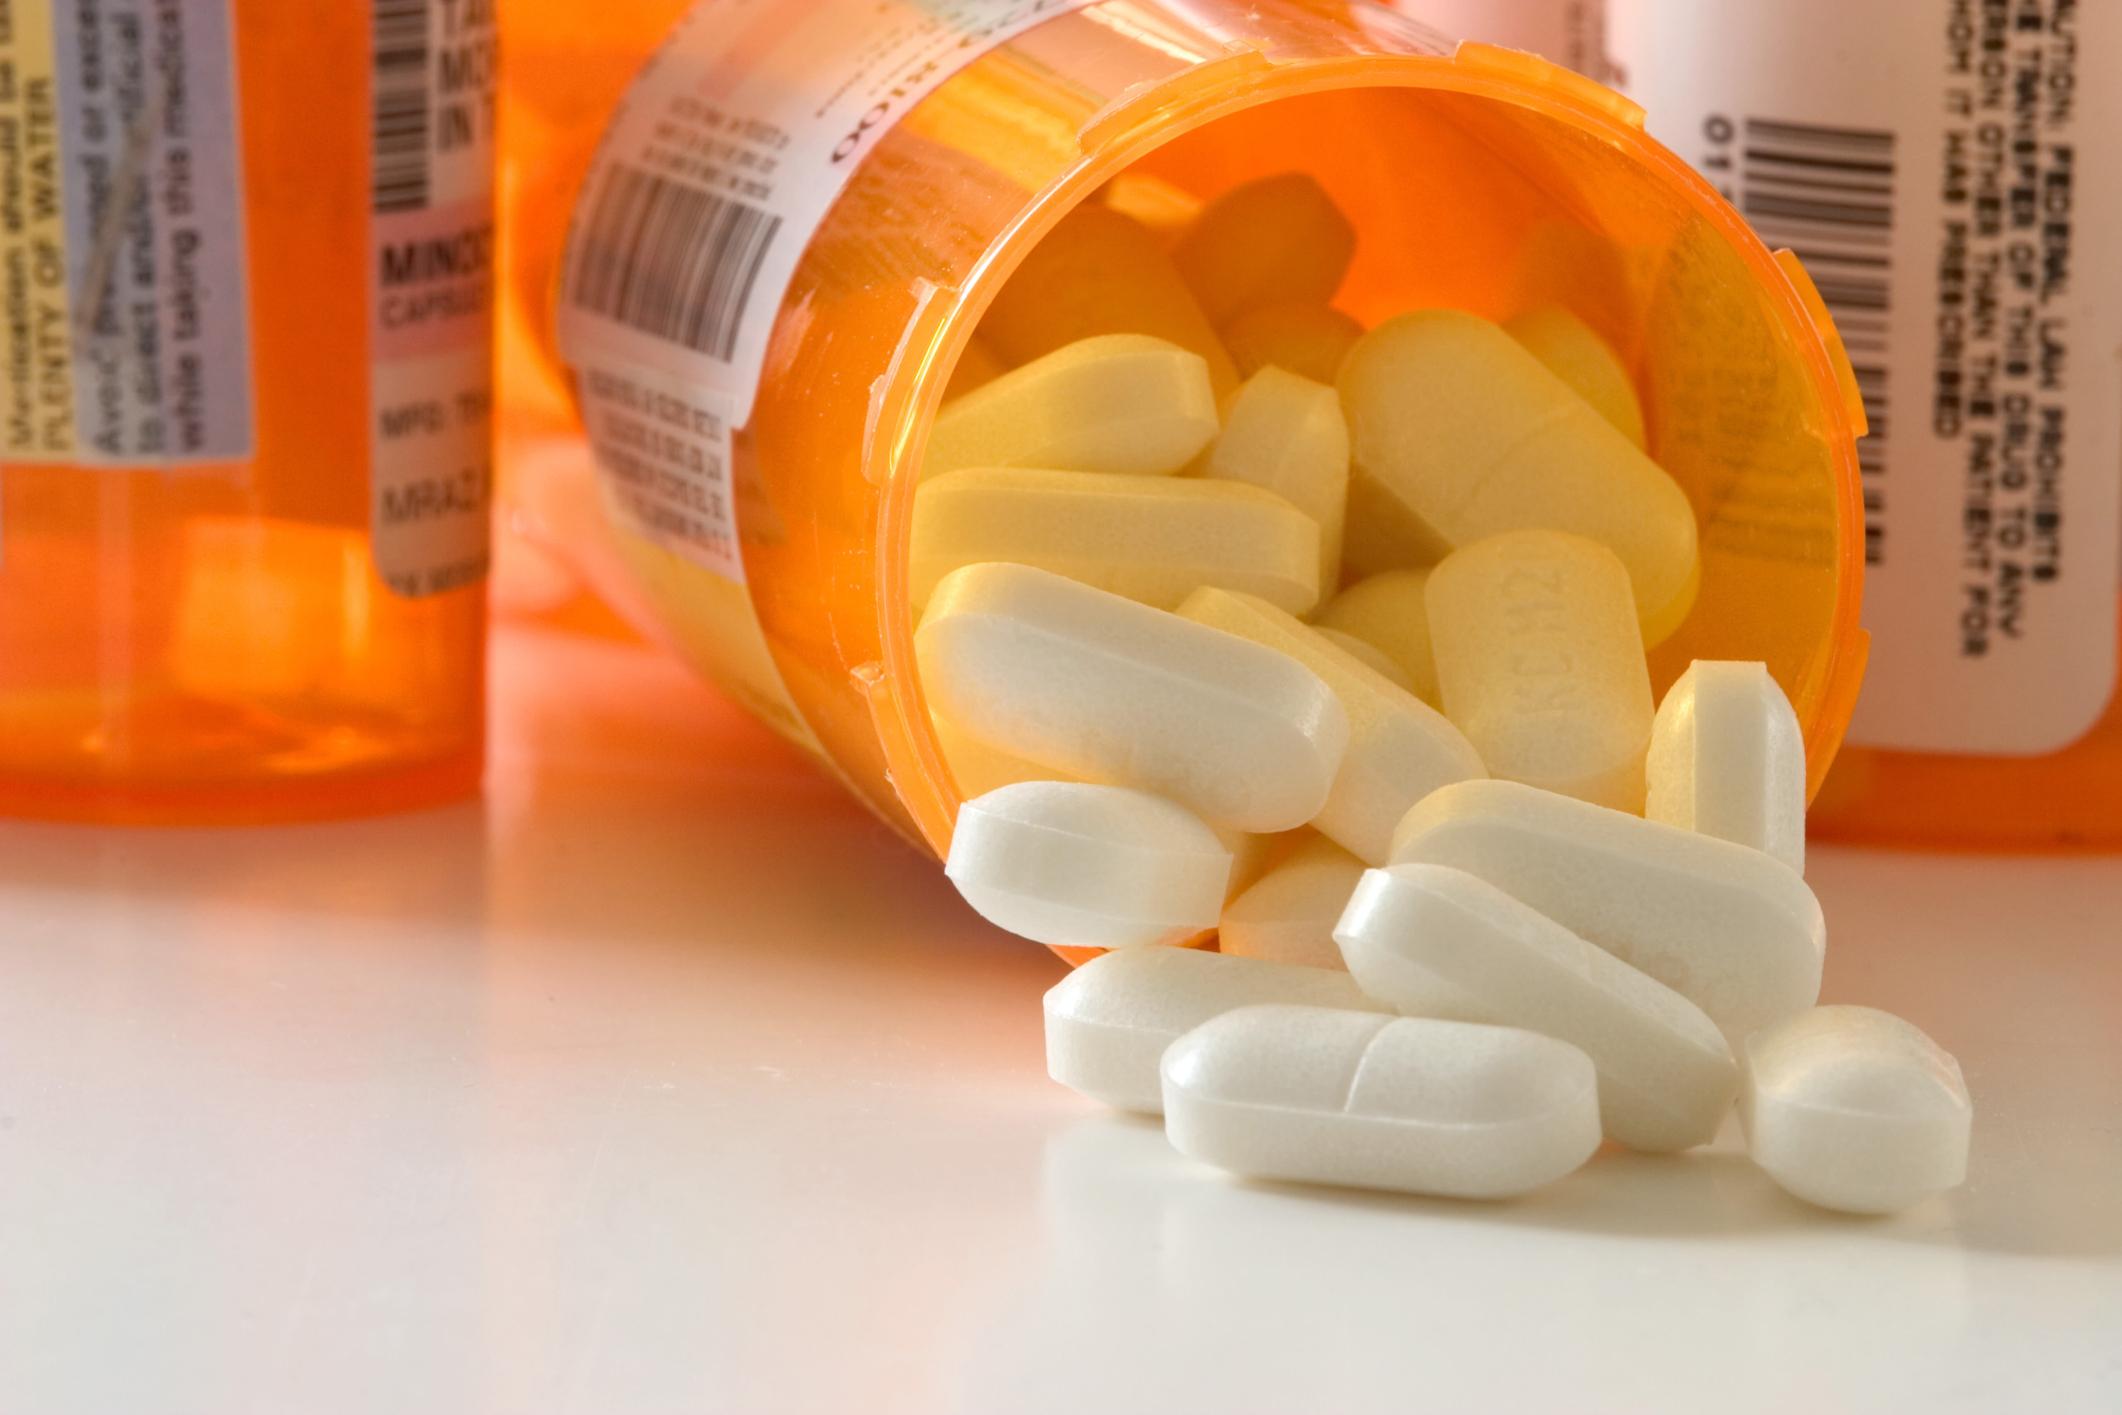 Prescription drug misuse growing problem with seniors